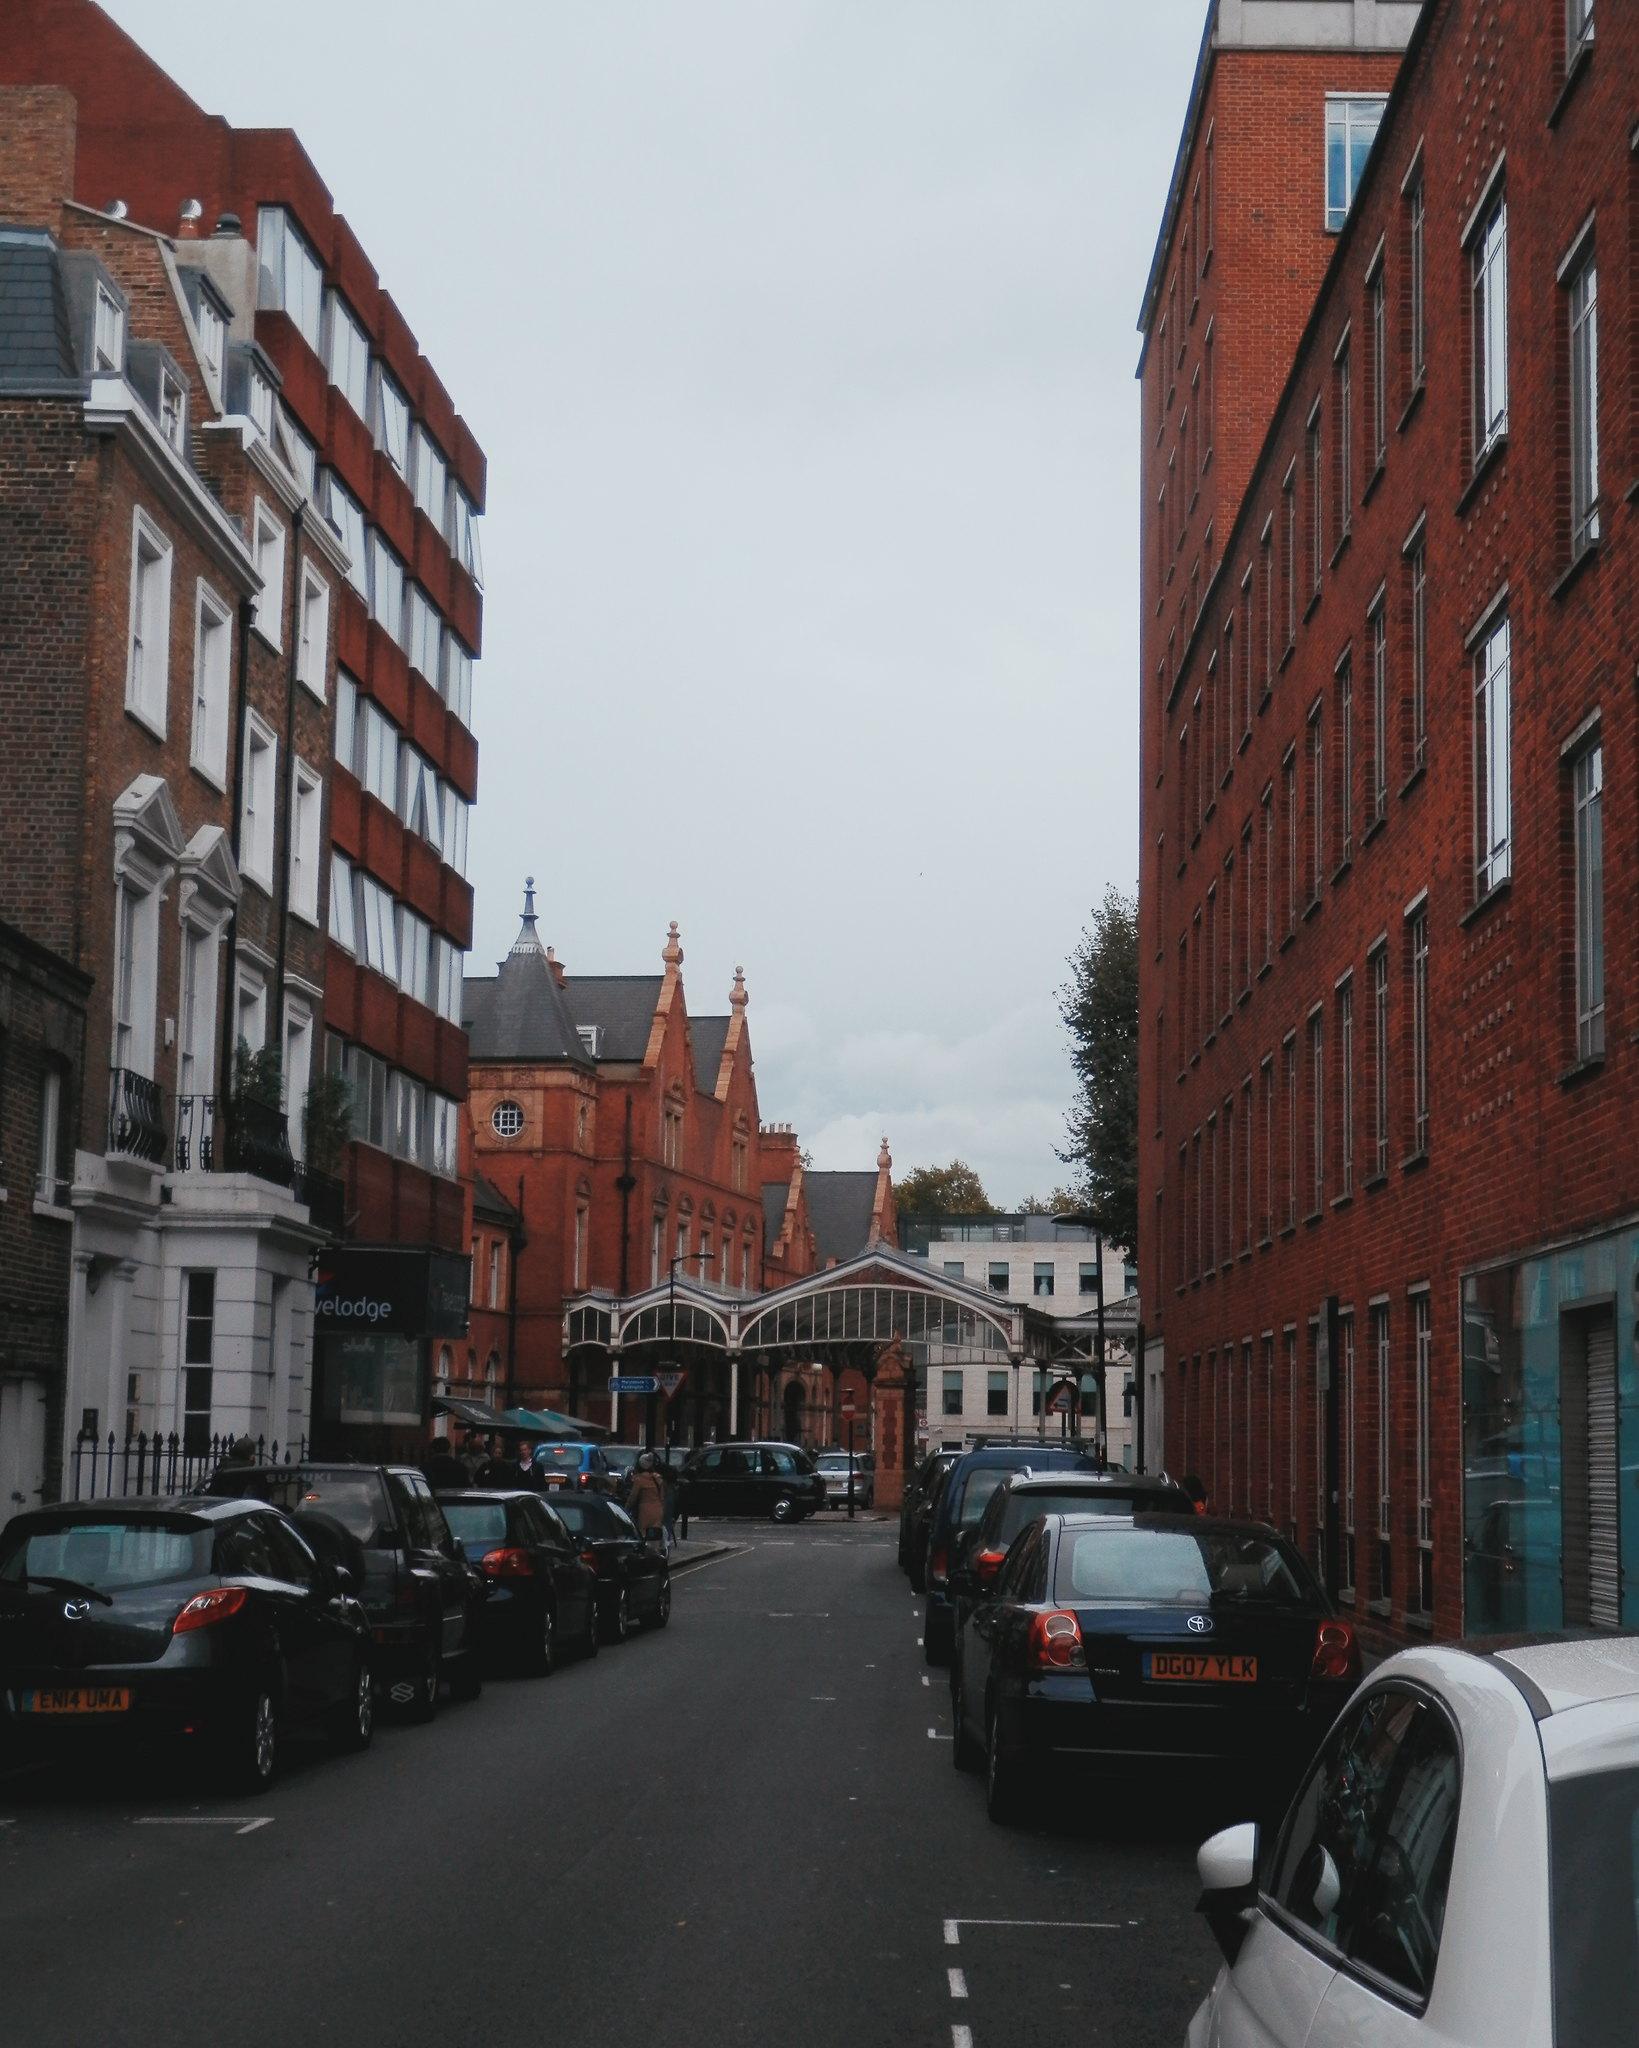 Bucket List Cross the Intersection of Abbey Road